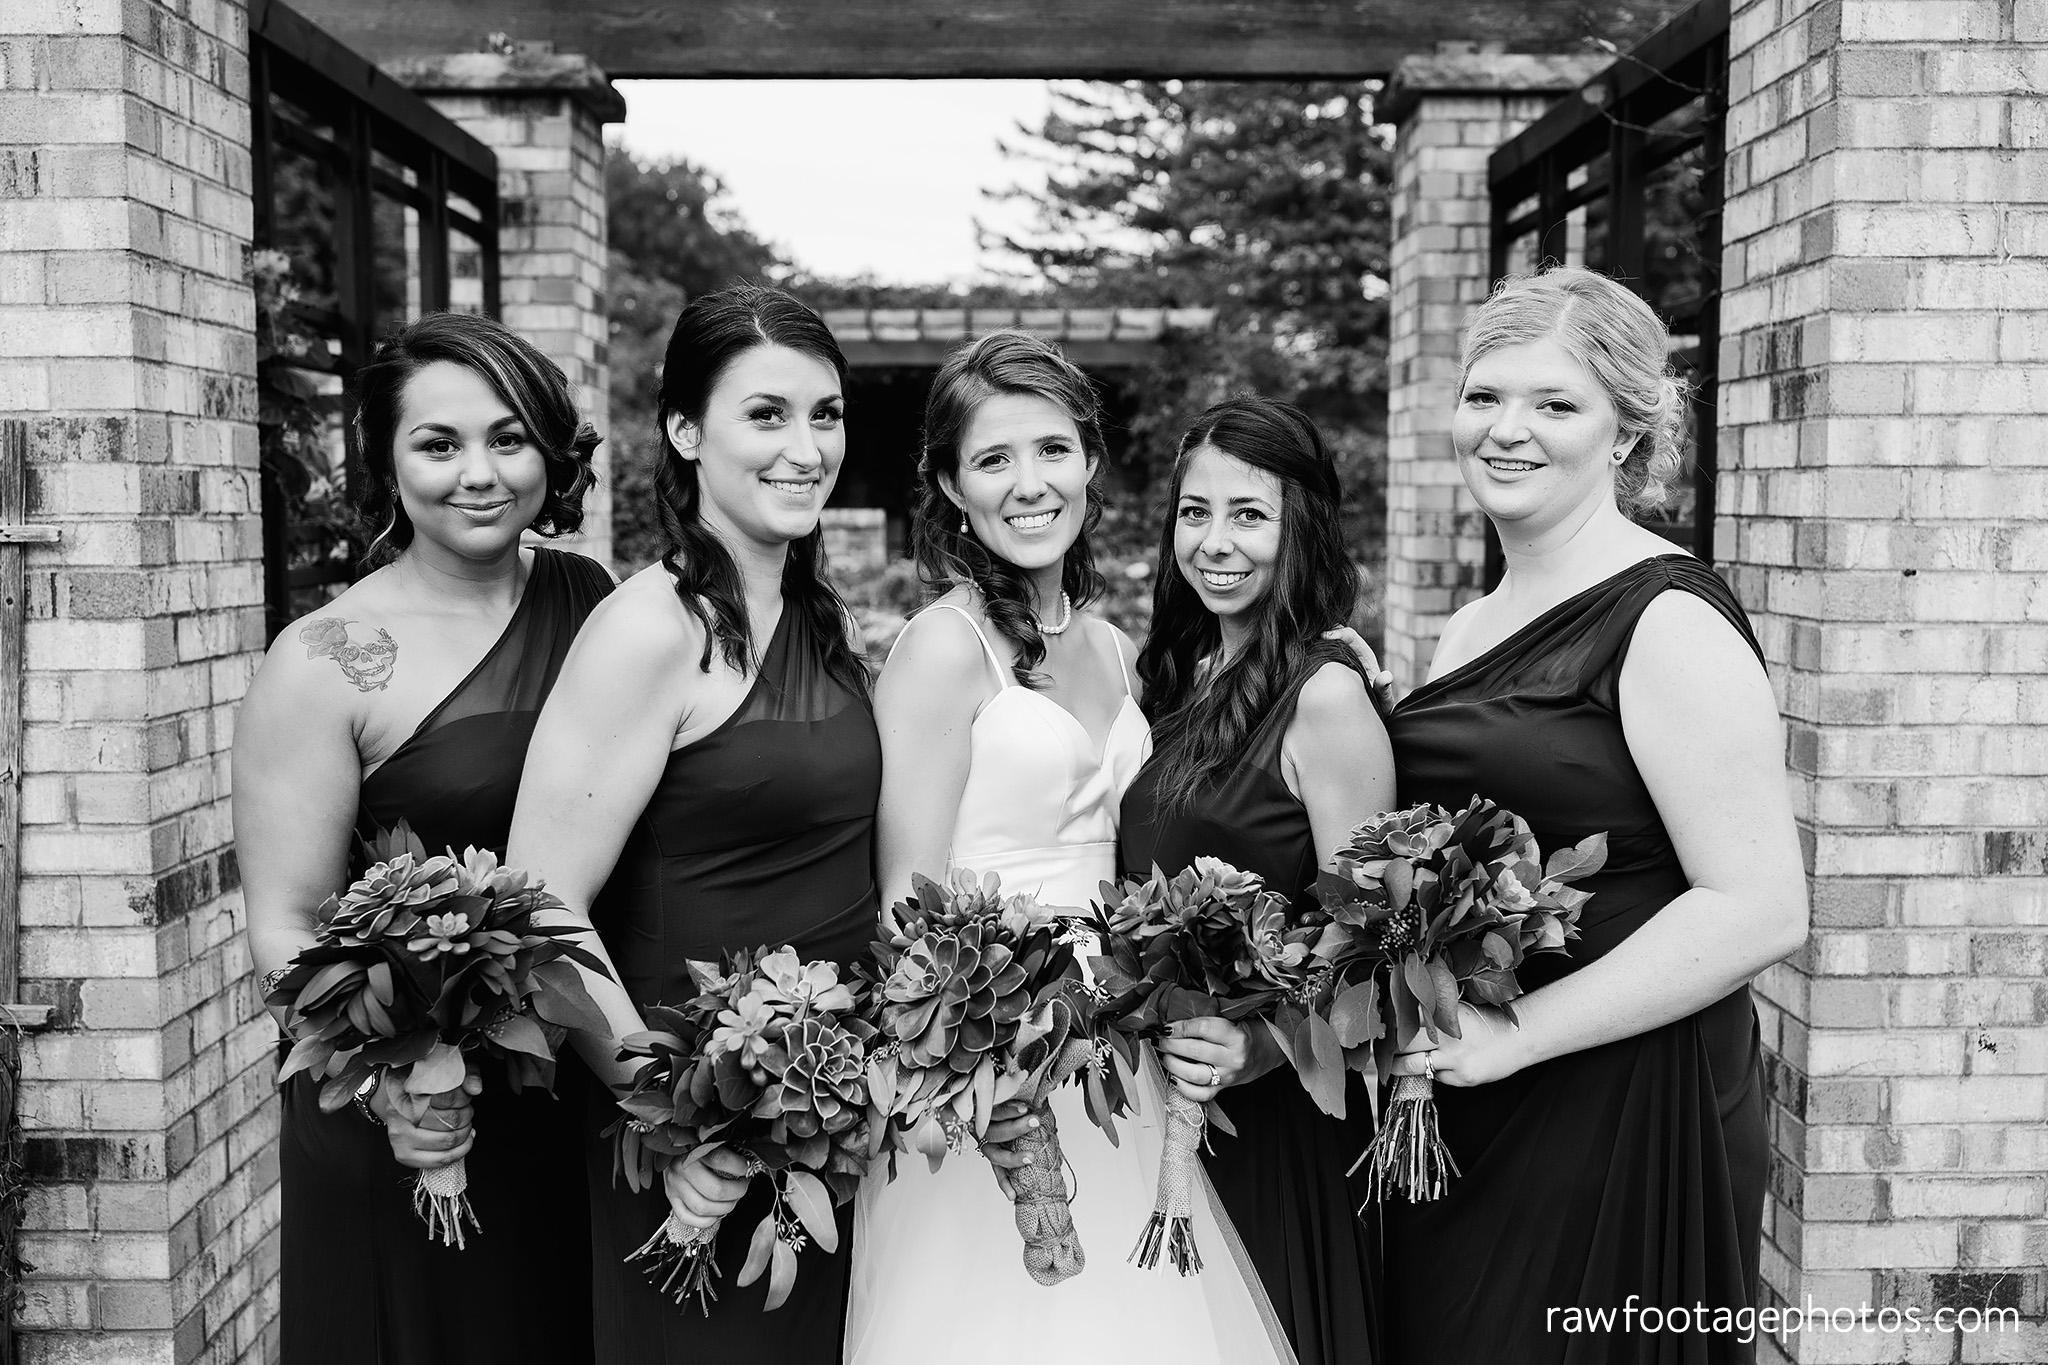 london_ontario_wedding_photographer-civic_gardens-springbank_park-succulent_bouquet-fall_wedding-bridge-raw_footage_photography052.jpg